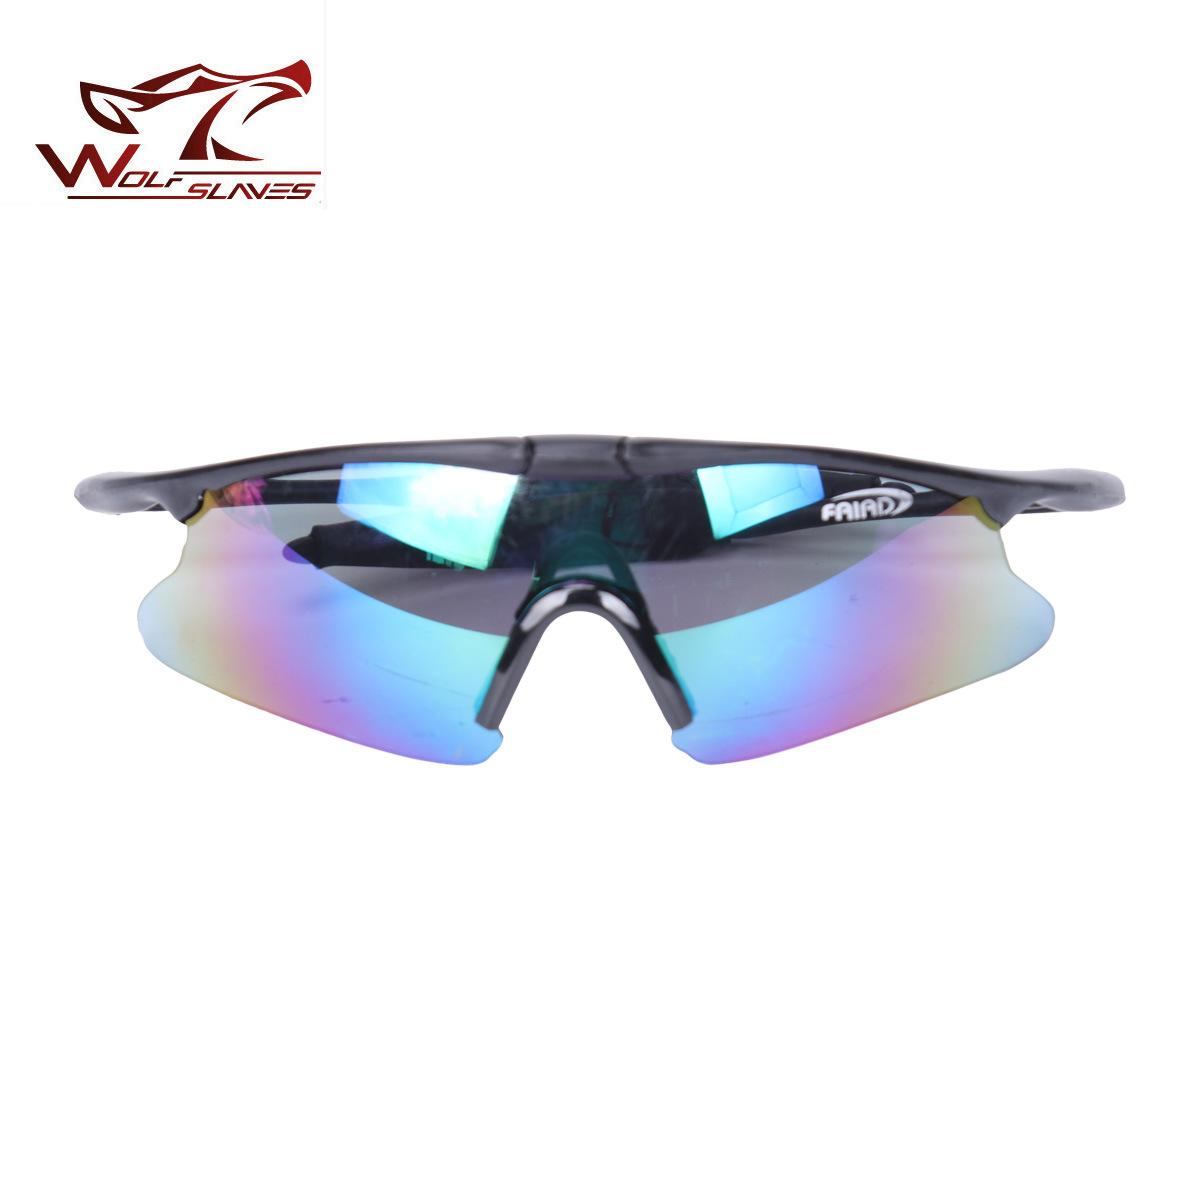 89c795b7e1954 Foto de Swat Airsoft táctico X100 Óculos óculos de desporto ao ar ...